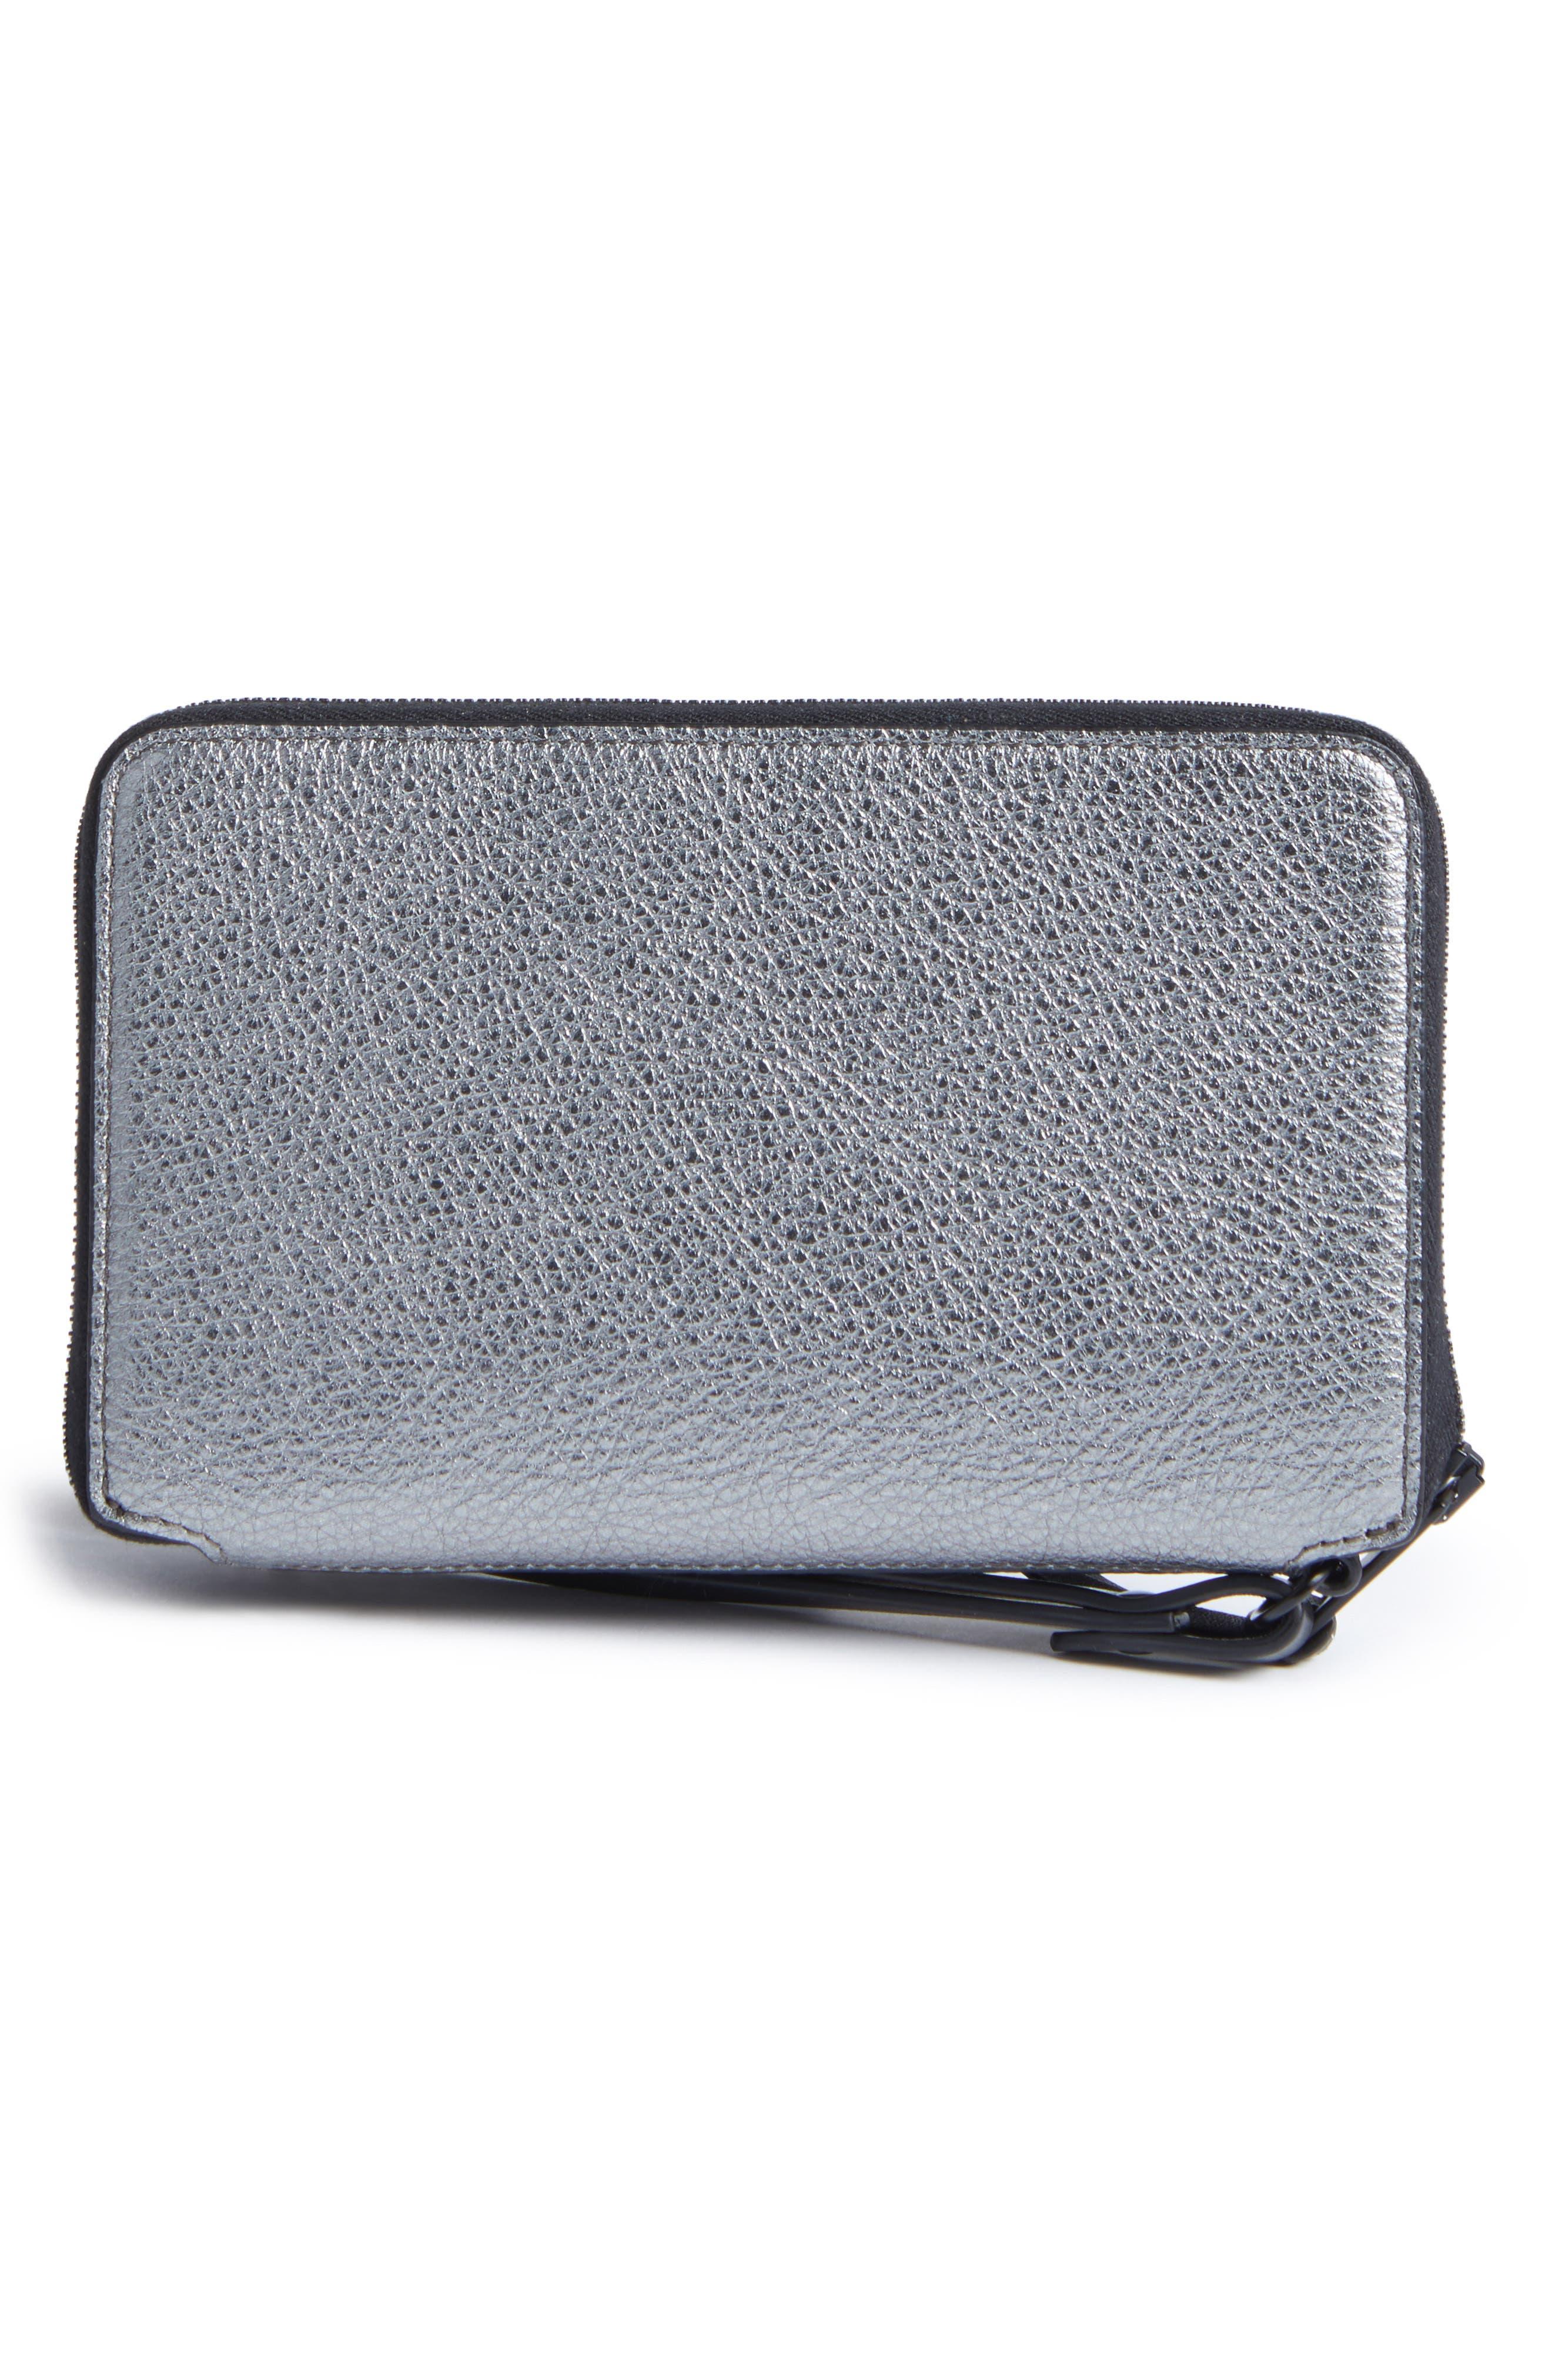 Devon Metallic Buffalo Leather Phone Wallet,                             Alternate thumbnail 3, color,                             Gunmetal